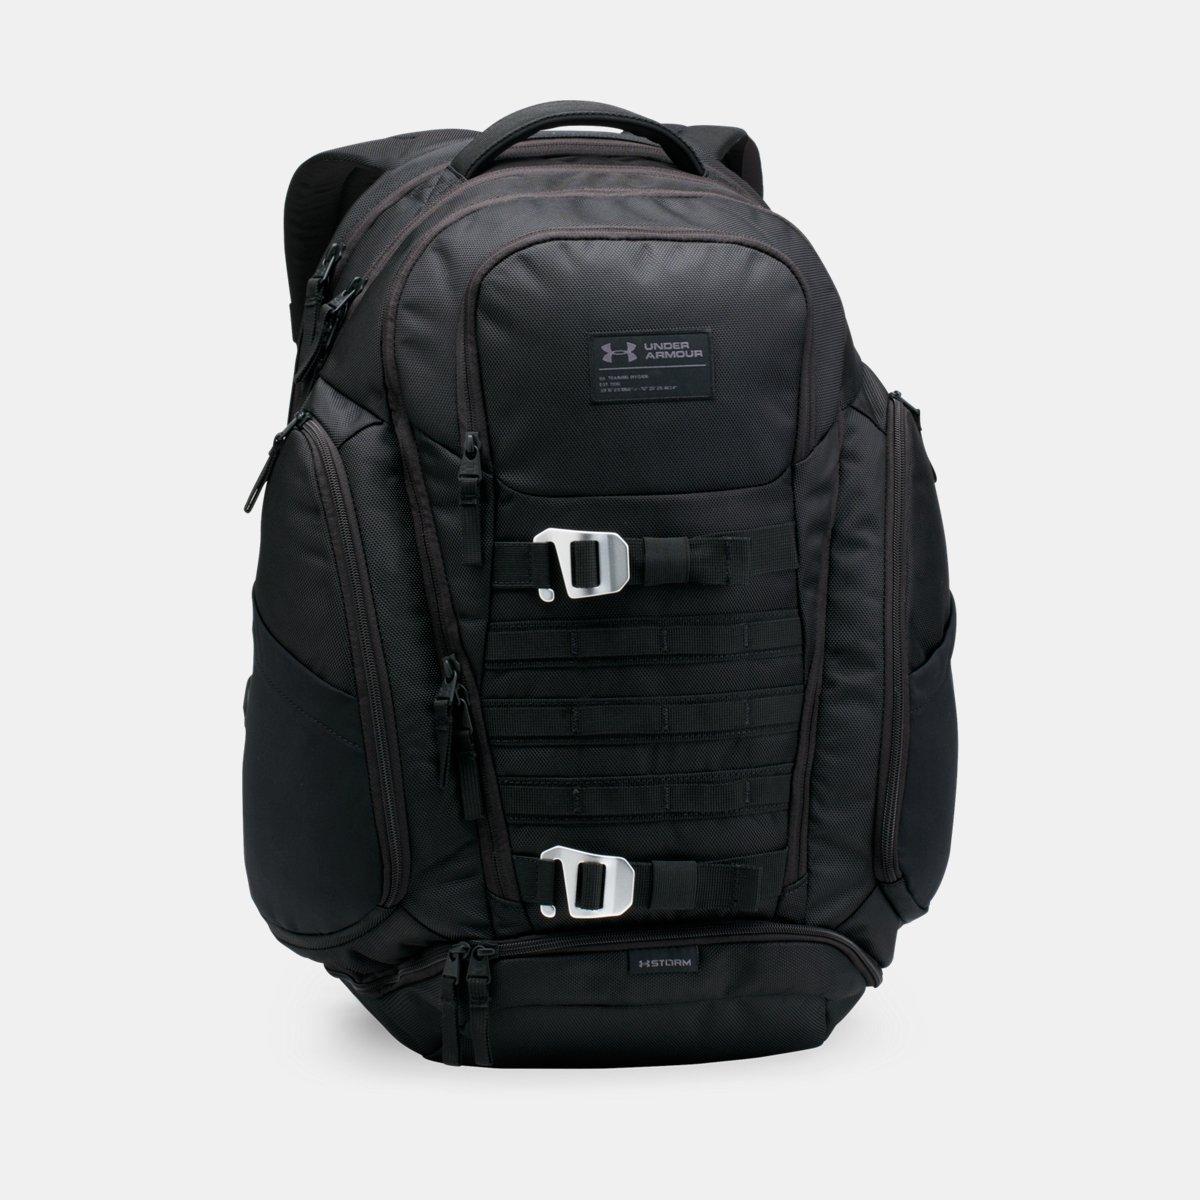 [UNDER ARMOUR] アンダーアーマー Men's UA Huey Backpack Black /Black [並行輸入品] B075376NF3